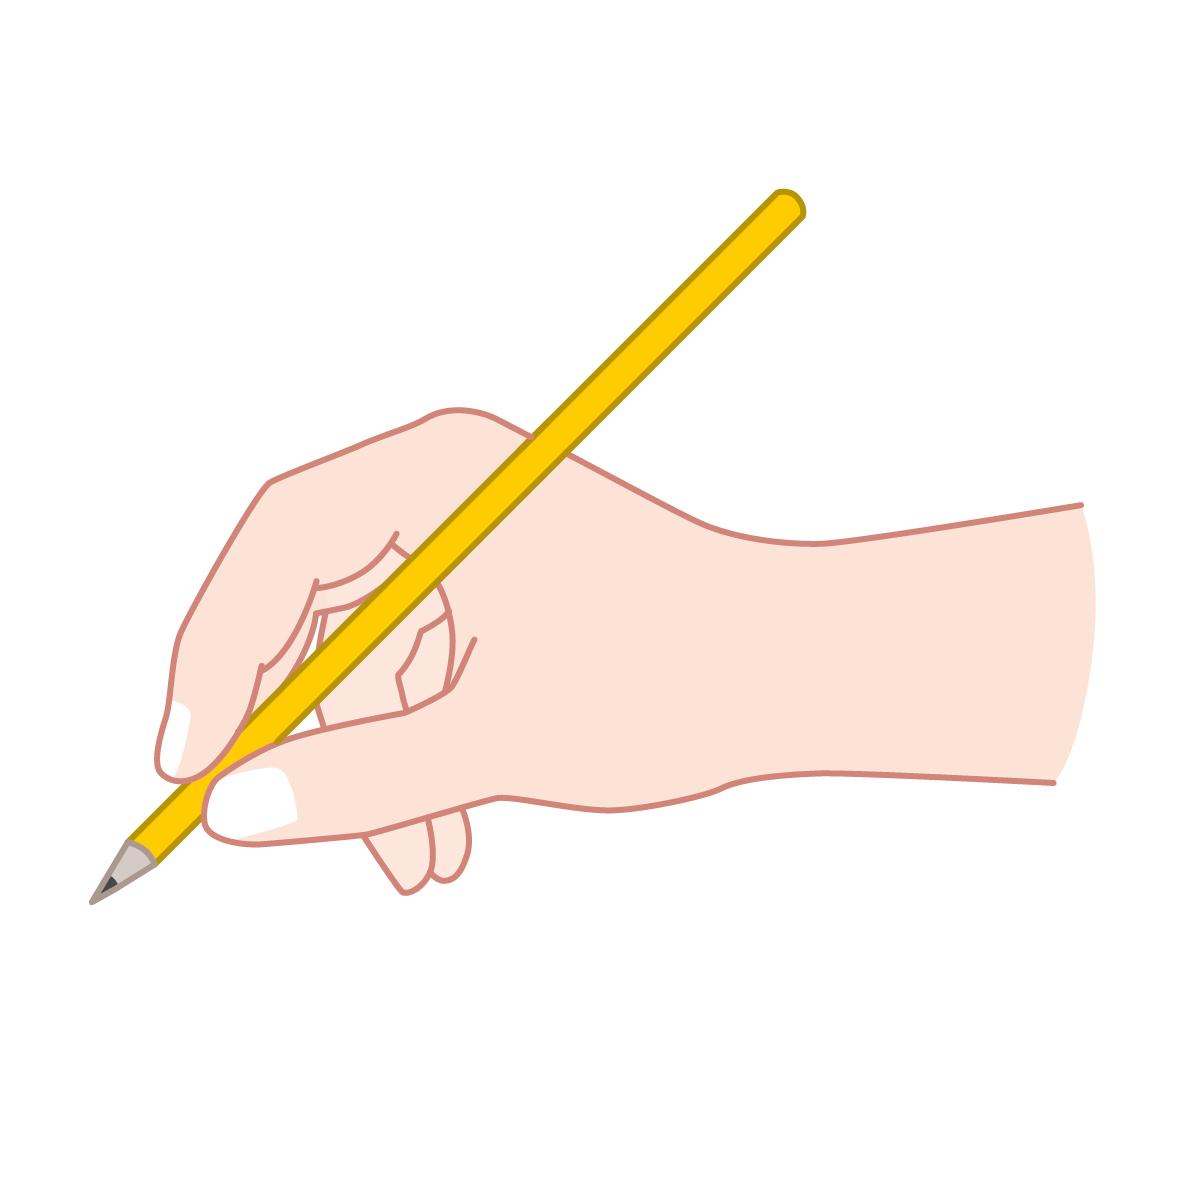 WT Hand 1.jpg